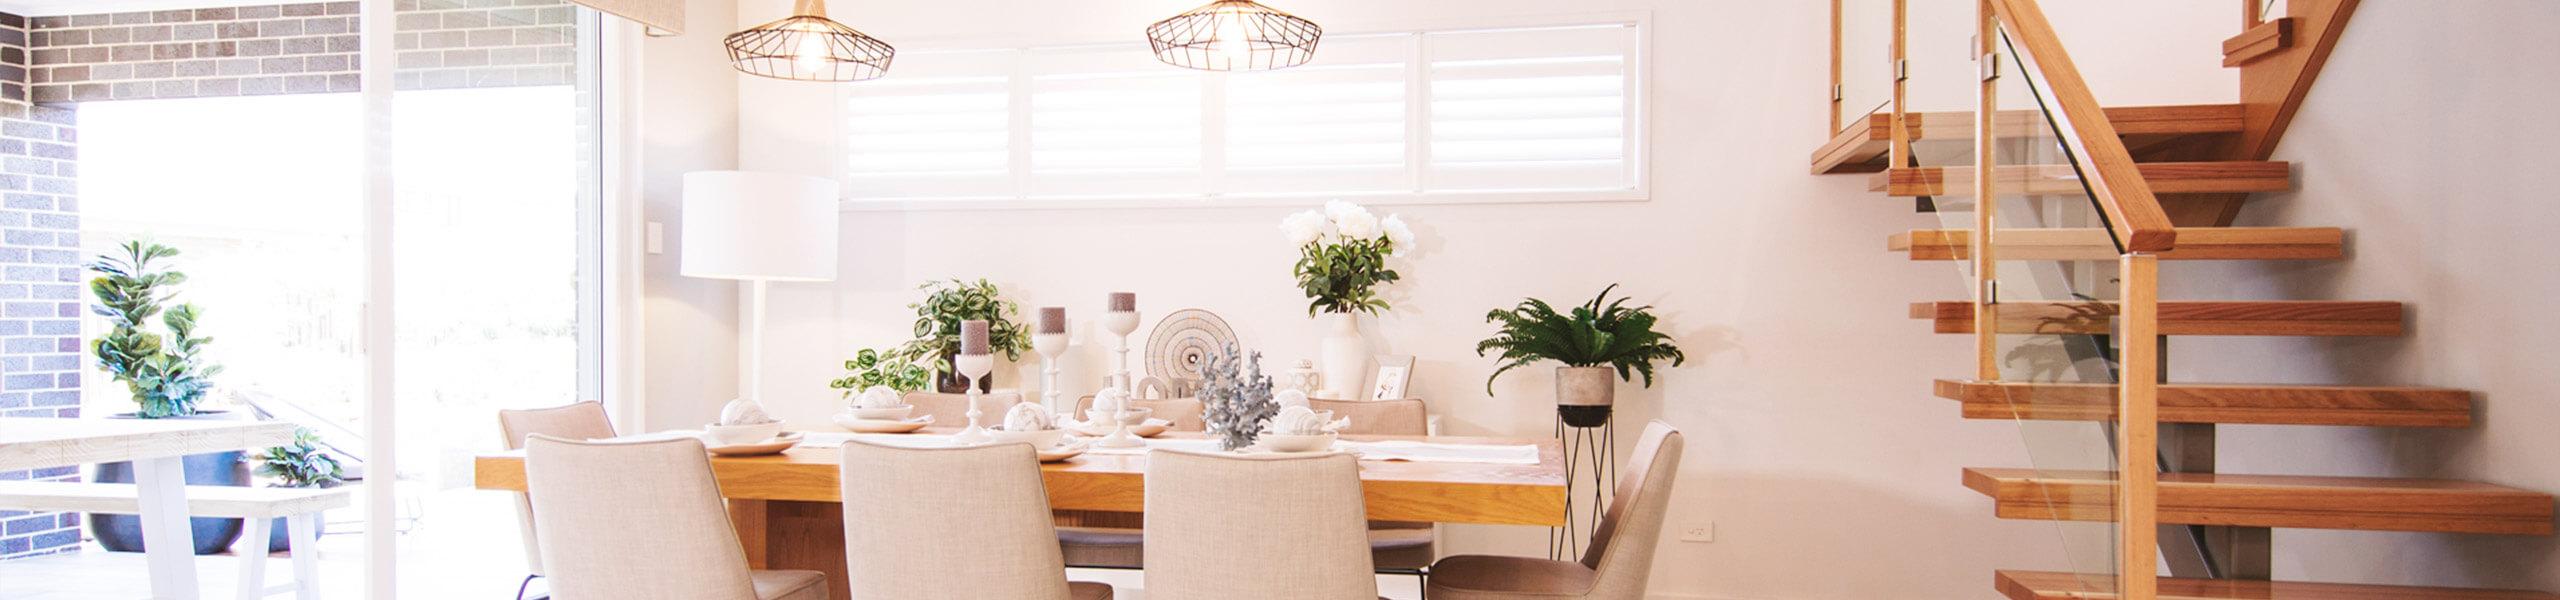 interior designers insideoutside-design dining